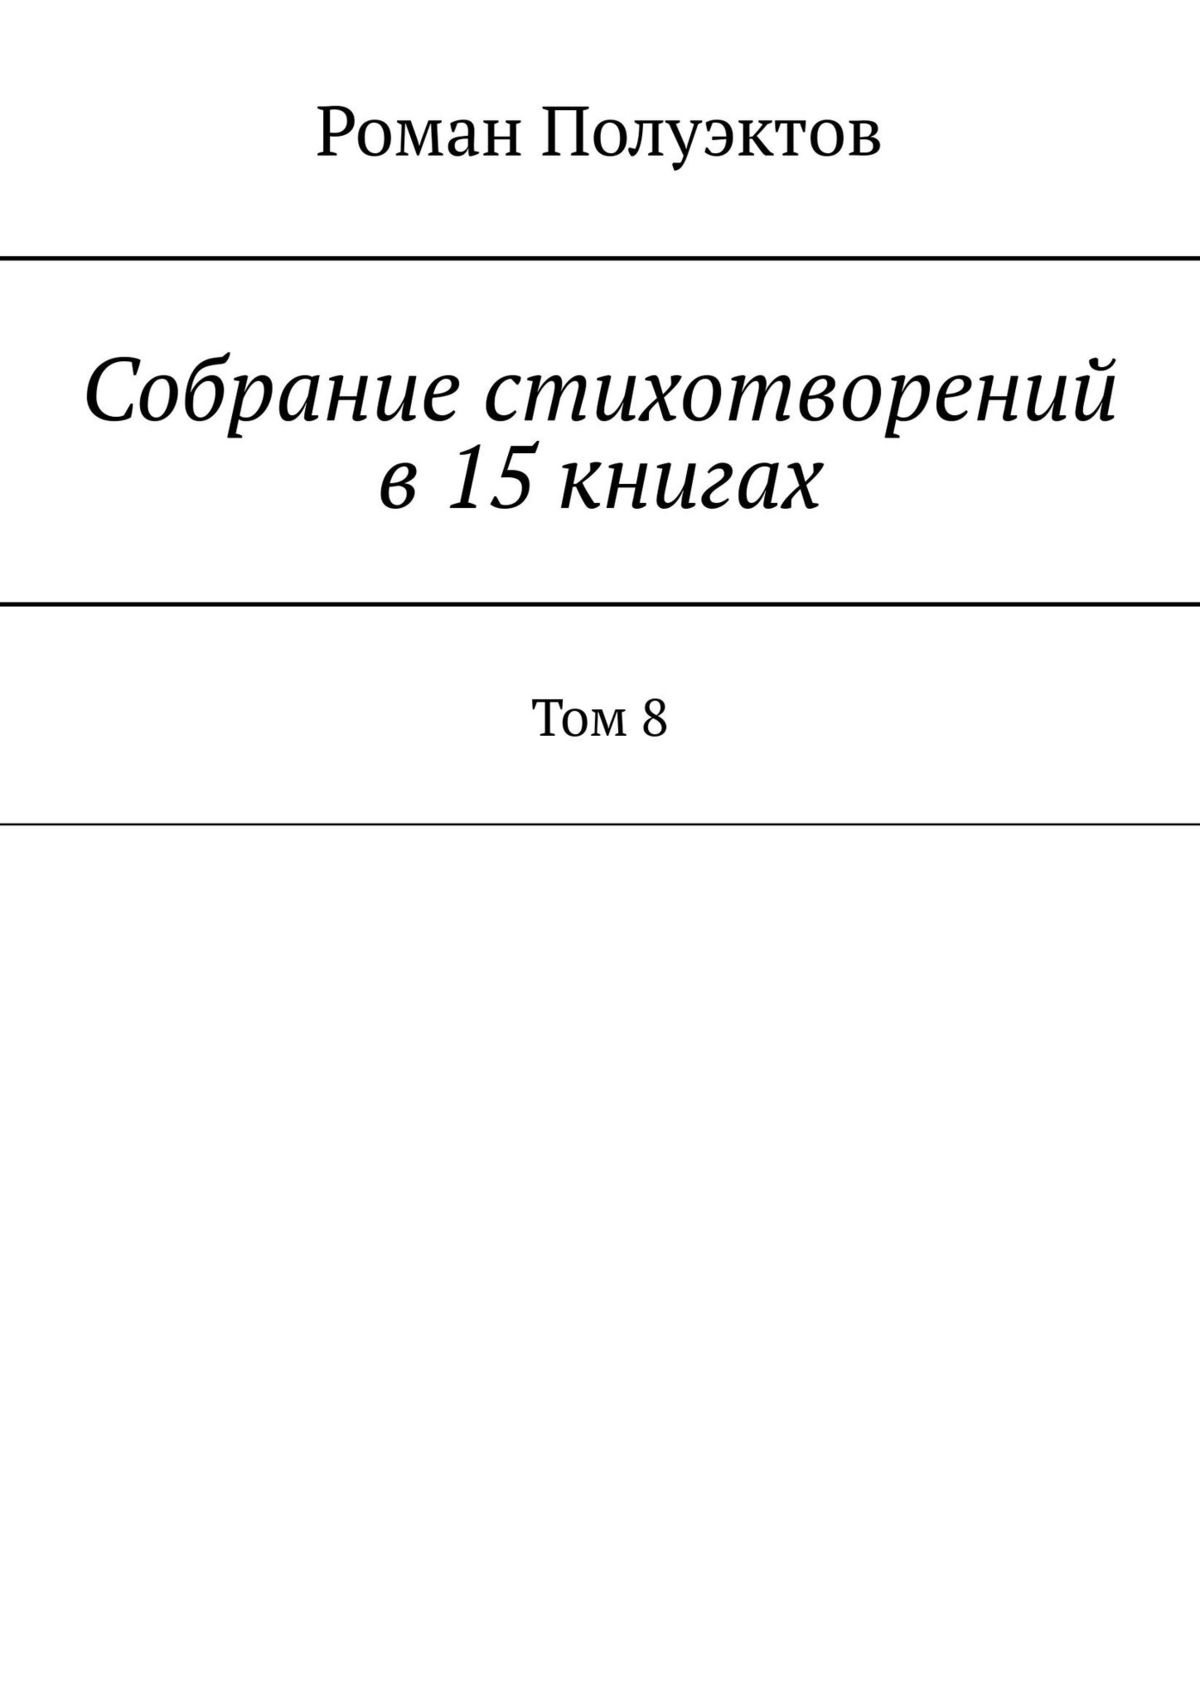 Роман Полуэктов Собраниестихотворений в15книгах. Том8 аппиано алессандра завтра все наладится роман